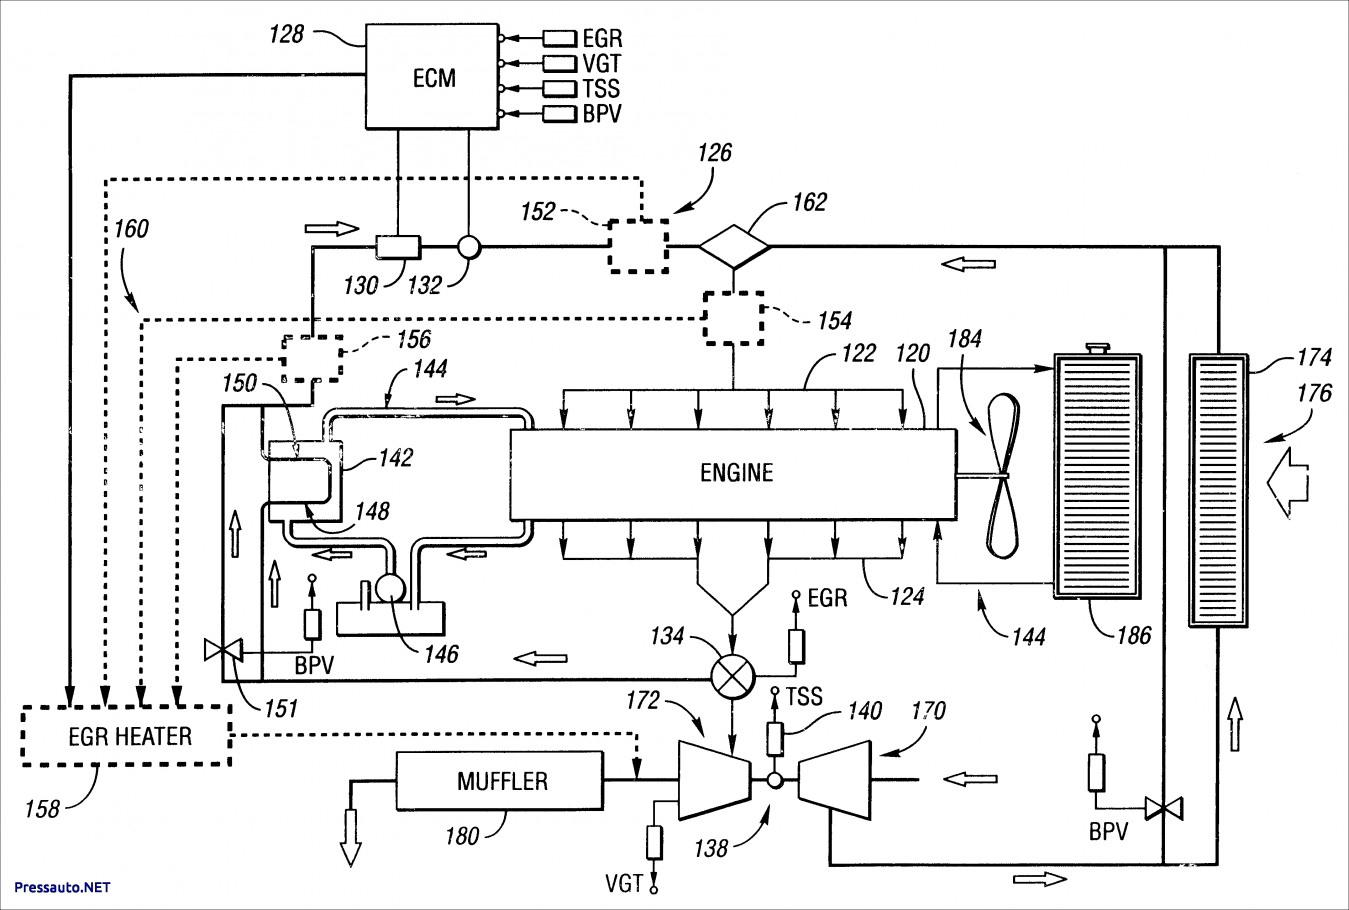 honda gx390 ignition wiring diagram | manual e-books - honda gx390 electric start  wiring